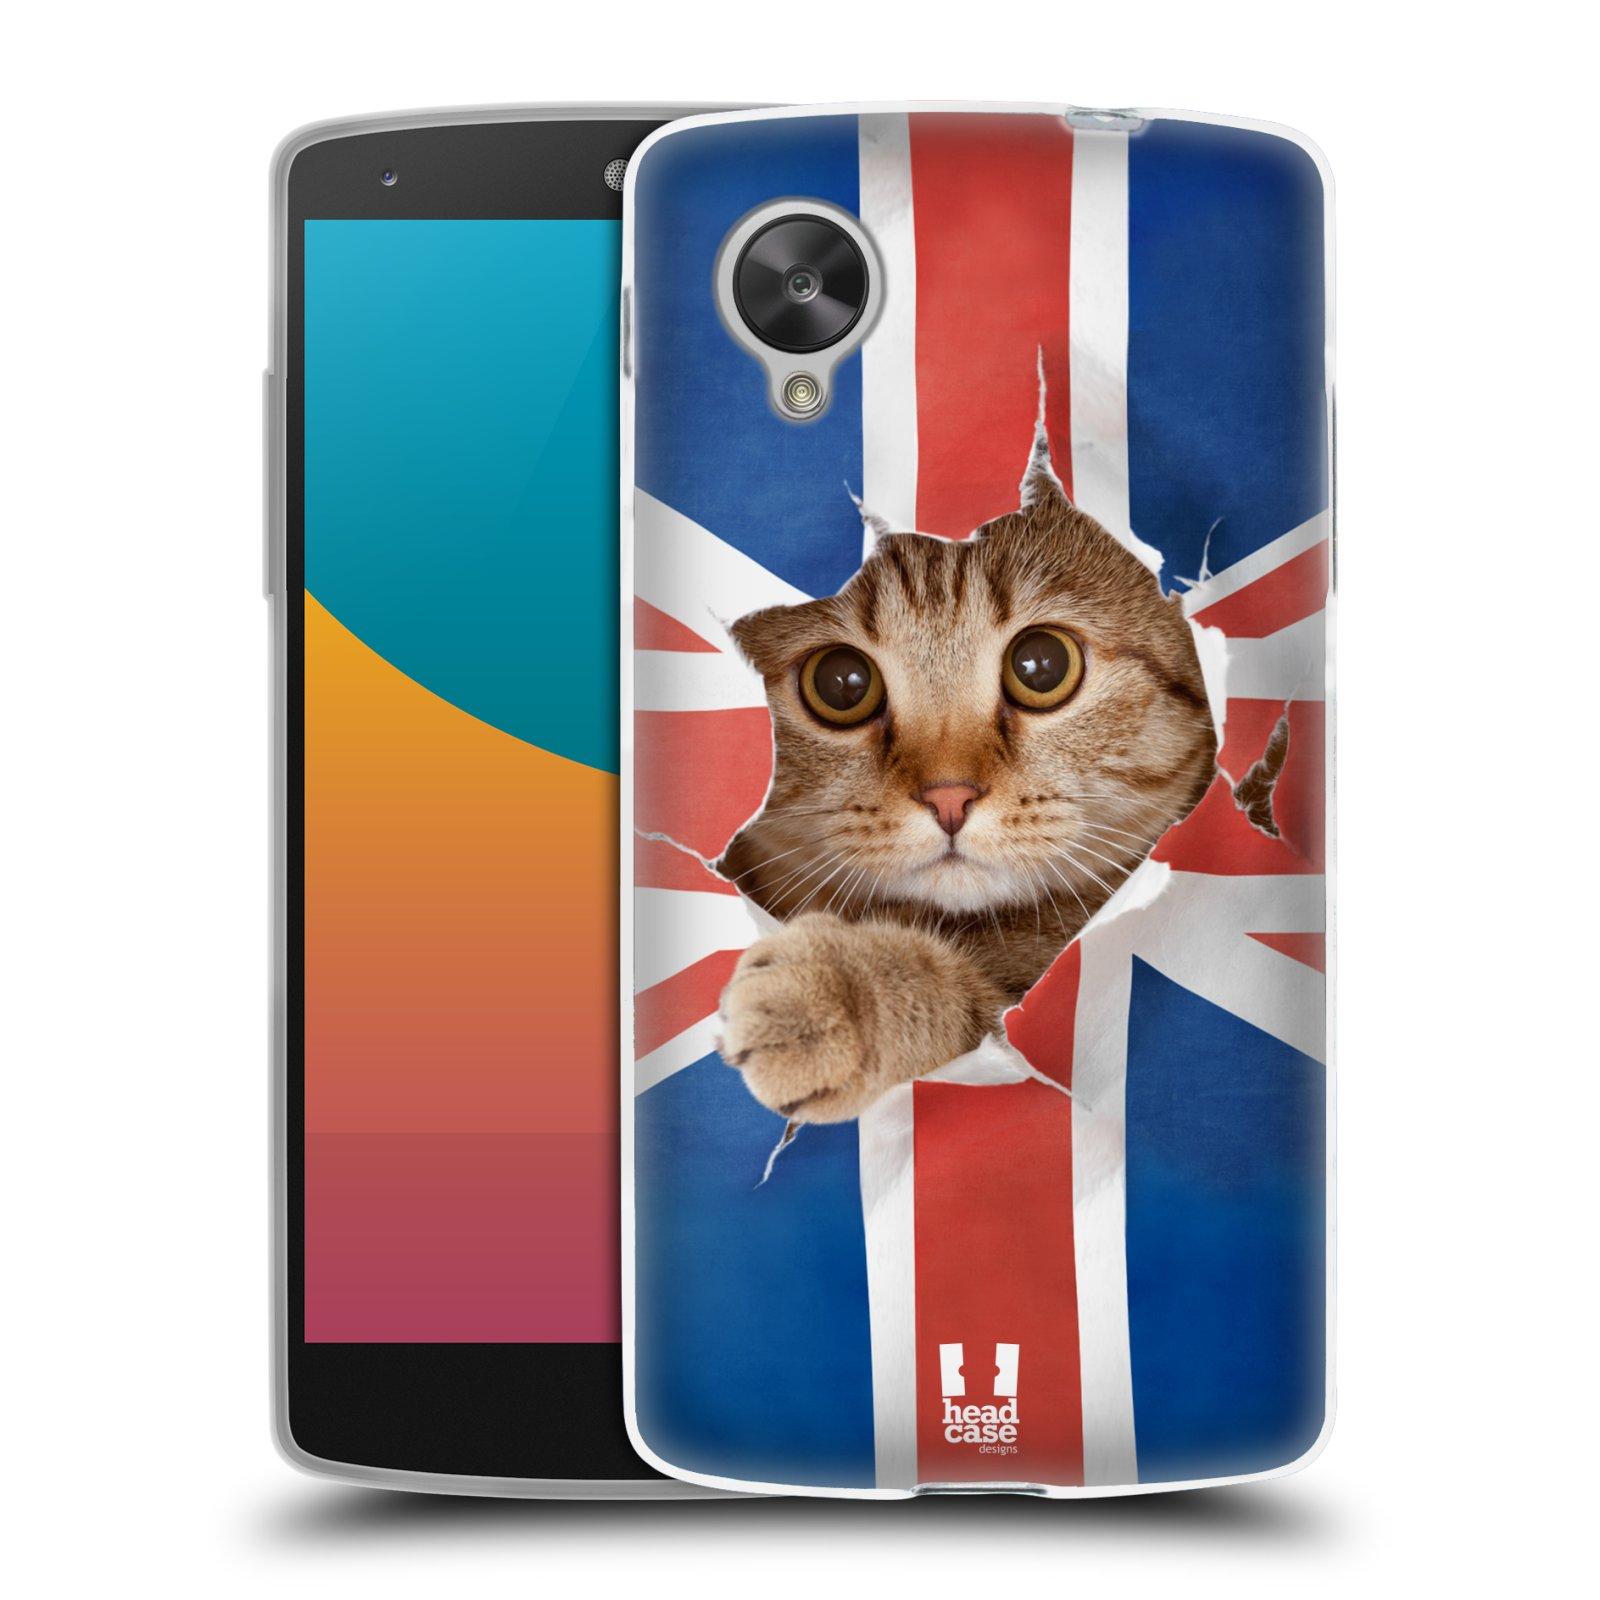 Silikonové pouzdro na mobil LG Nexus 5 HEAD CASE KOČKA A VLAJKA (Silikonový kryt či obal na mobilní telefon LG Google Nexus 5 D821)